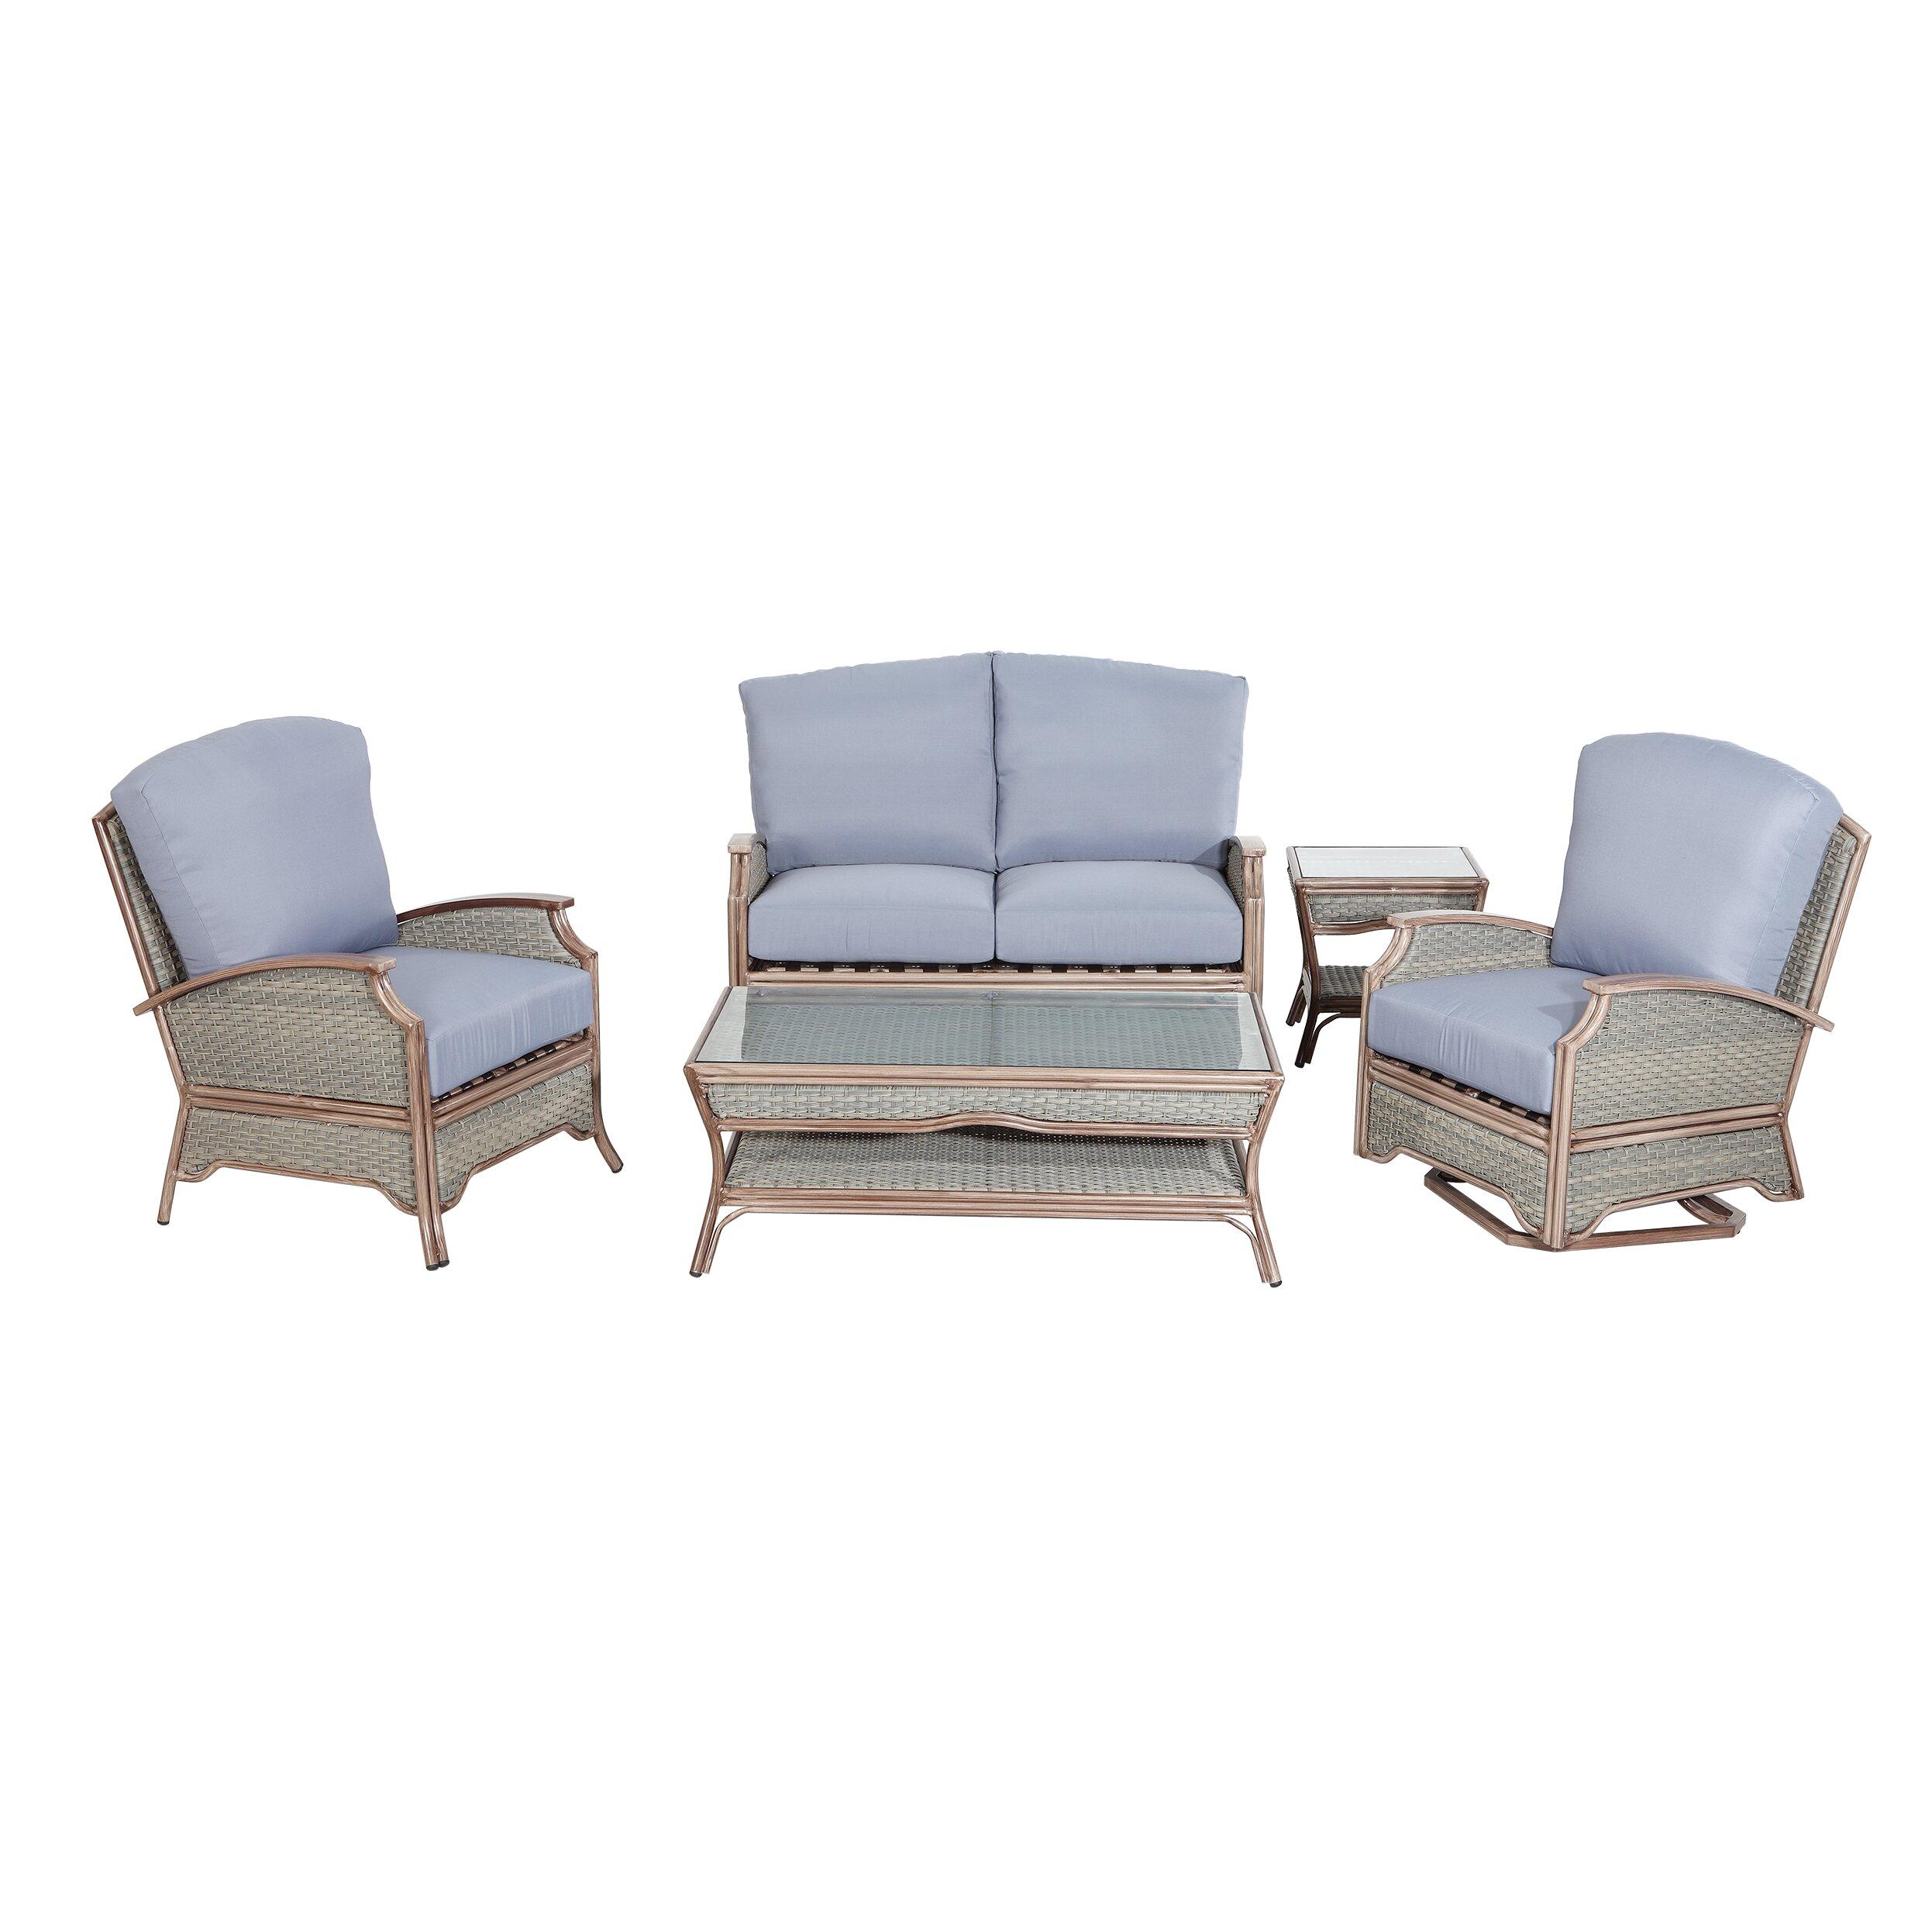 Marvelous Rattan Outdoor Furniture Pompano 5 Piece Deep Seating Group Wayfair .